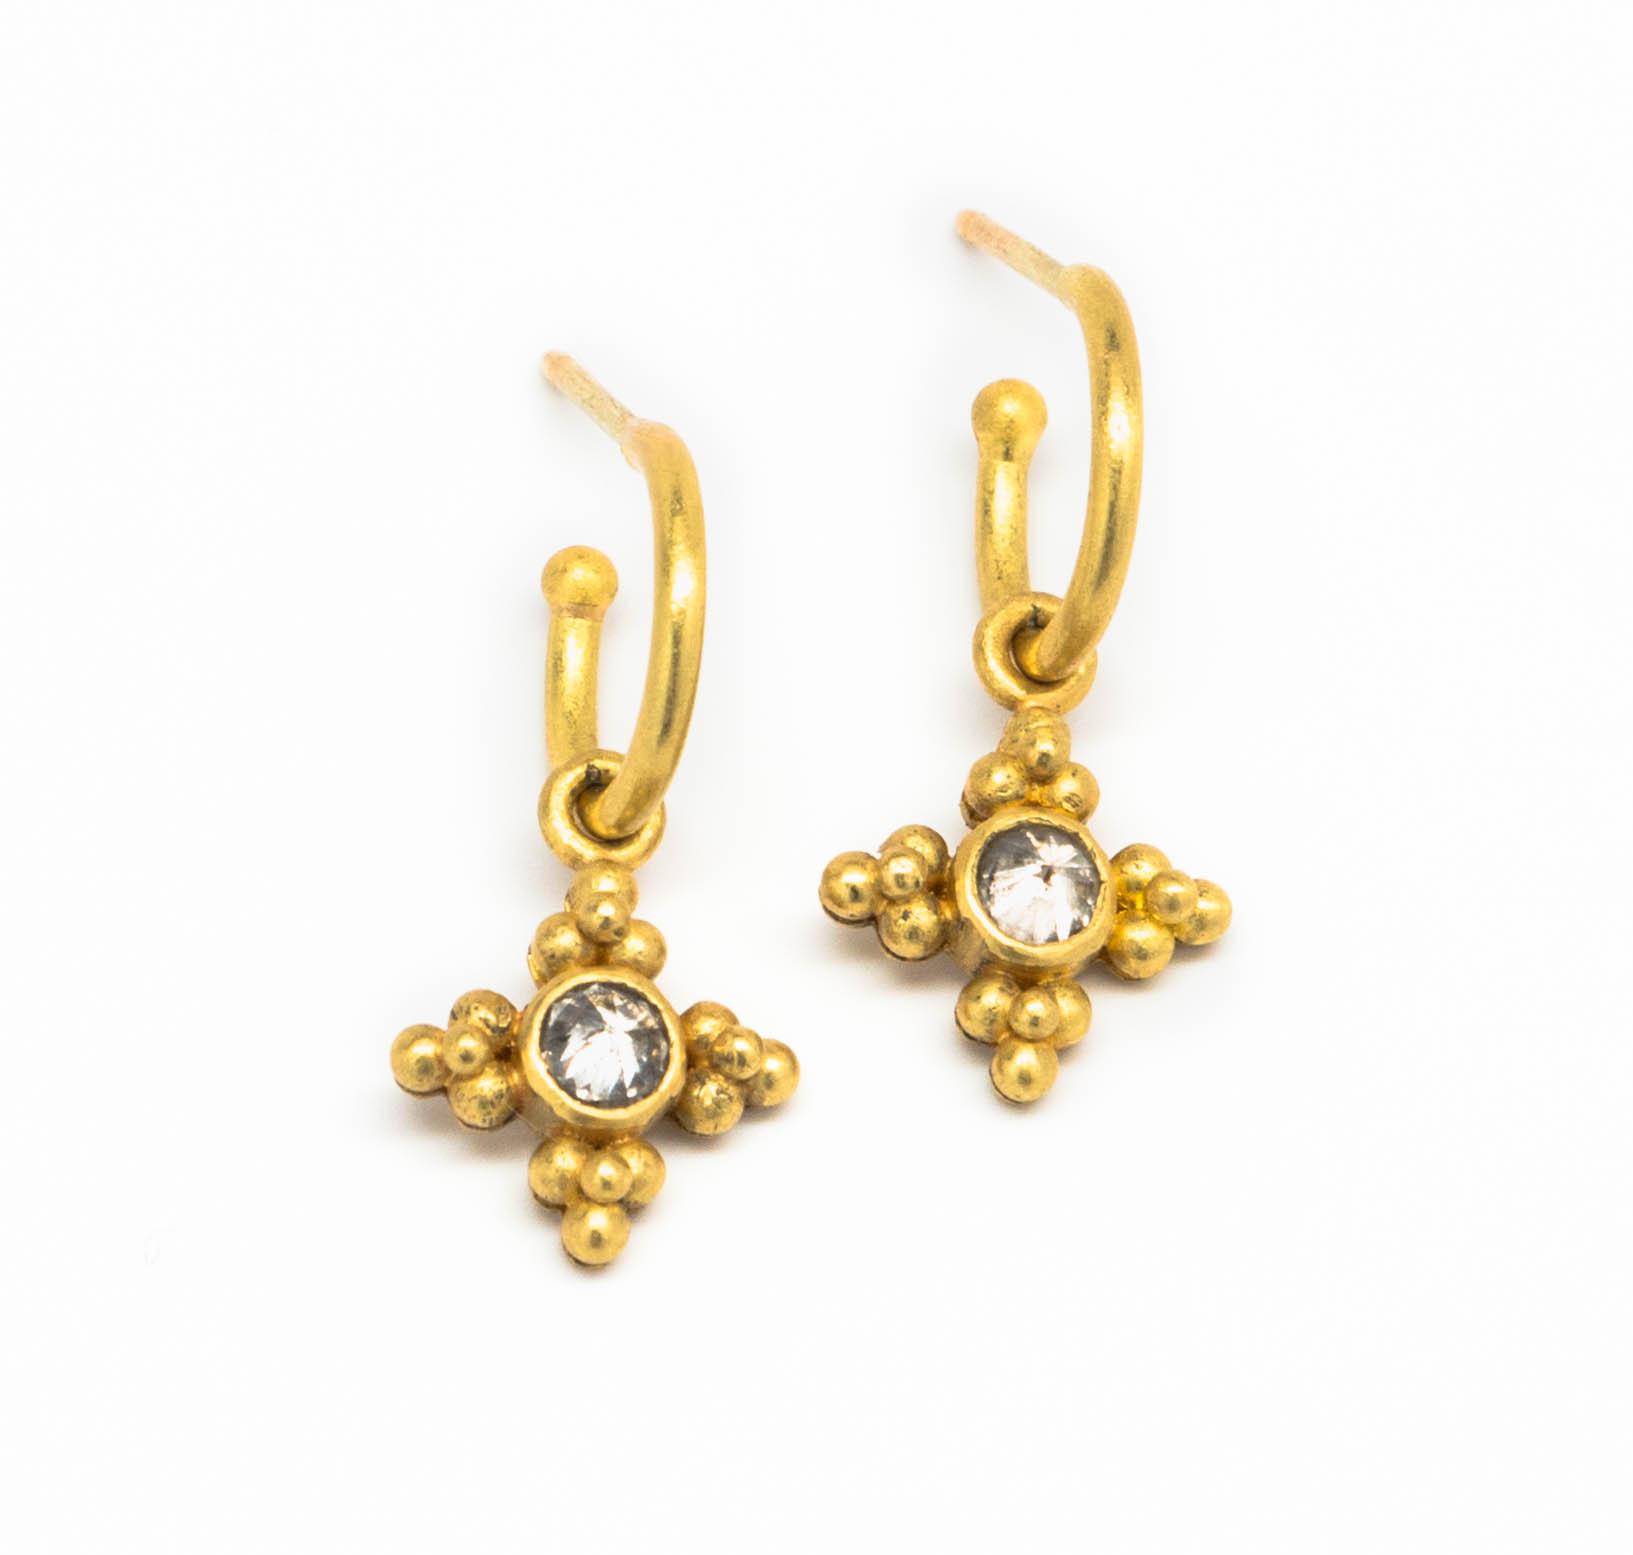 dec21 jewelry5-591.jpg